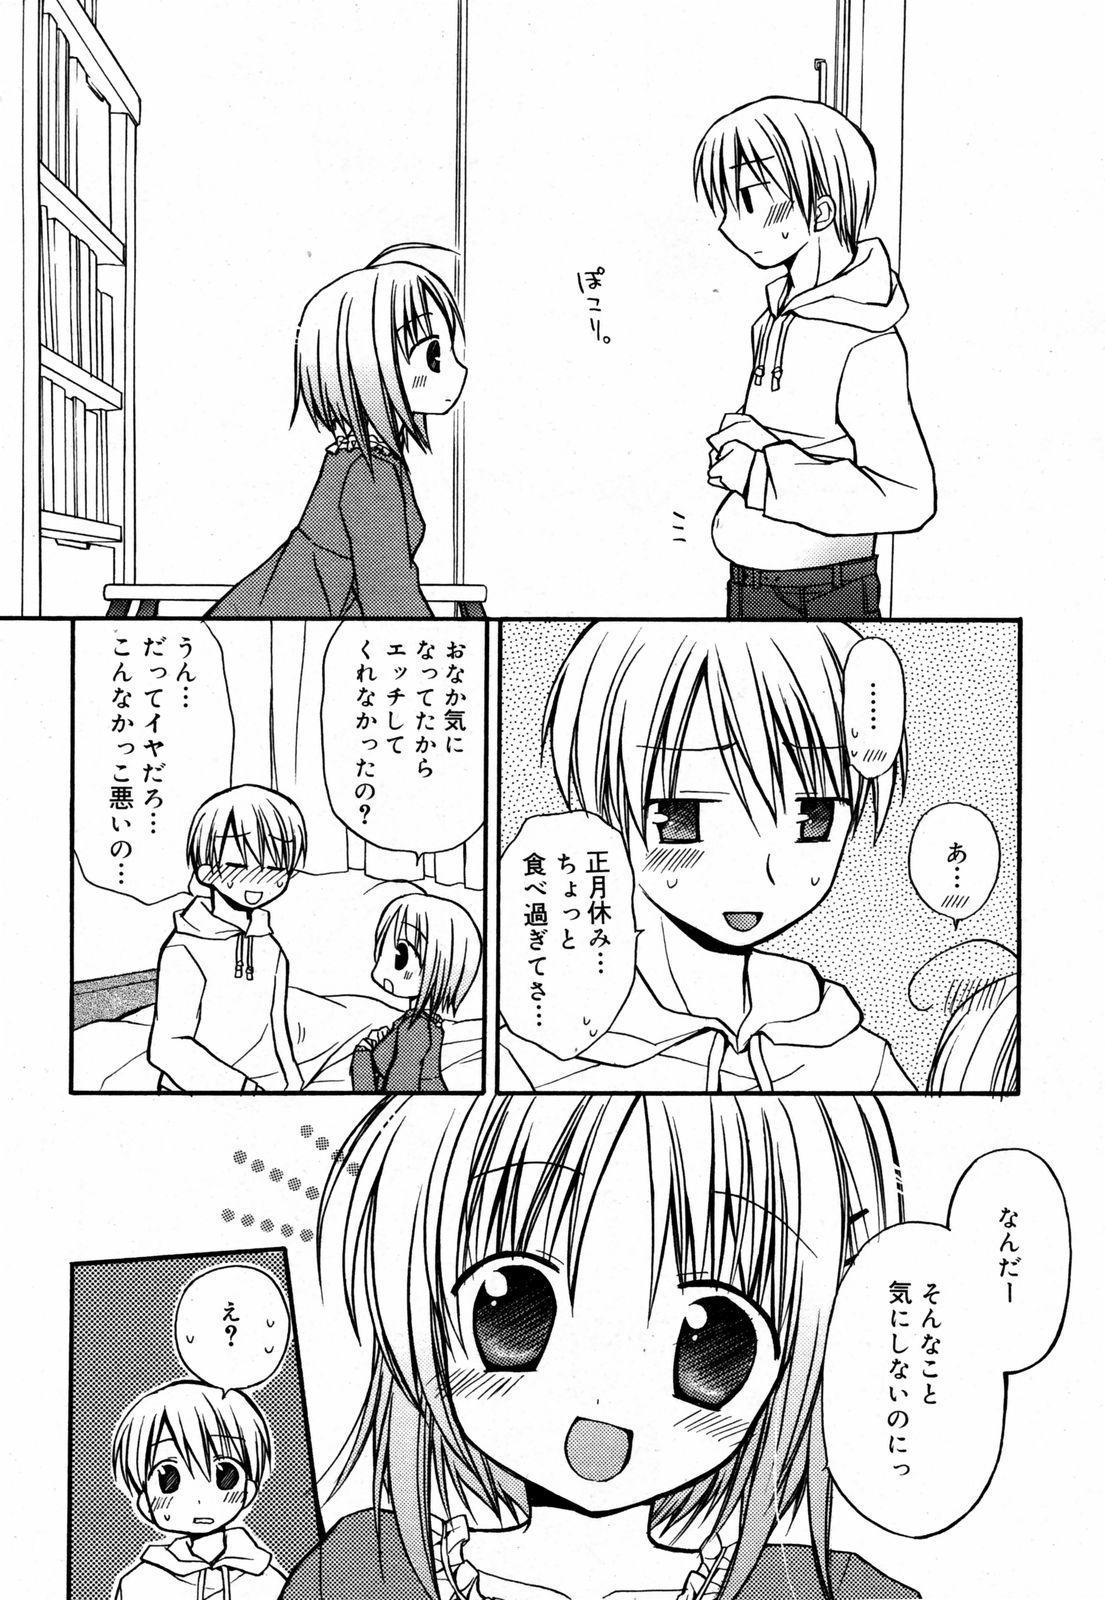 Manga Bangaichi 2008-03 23